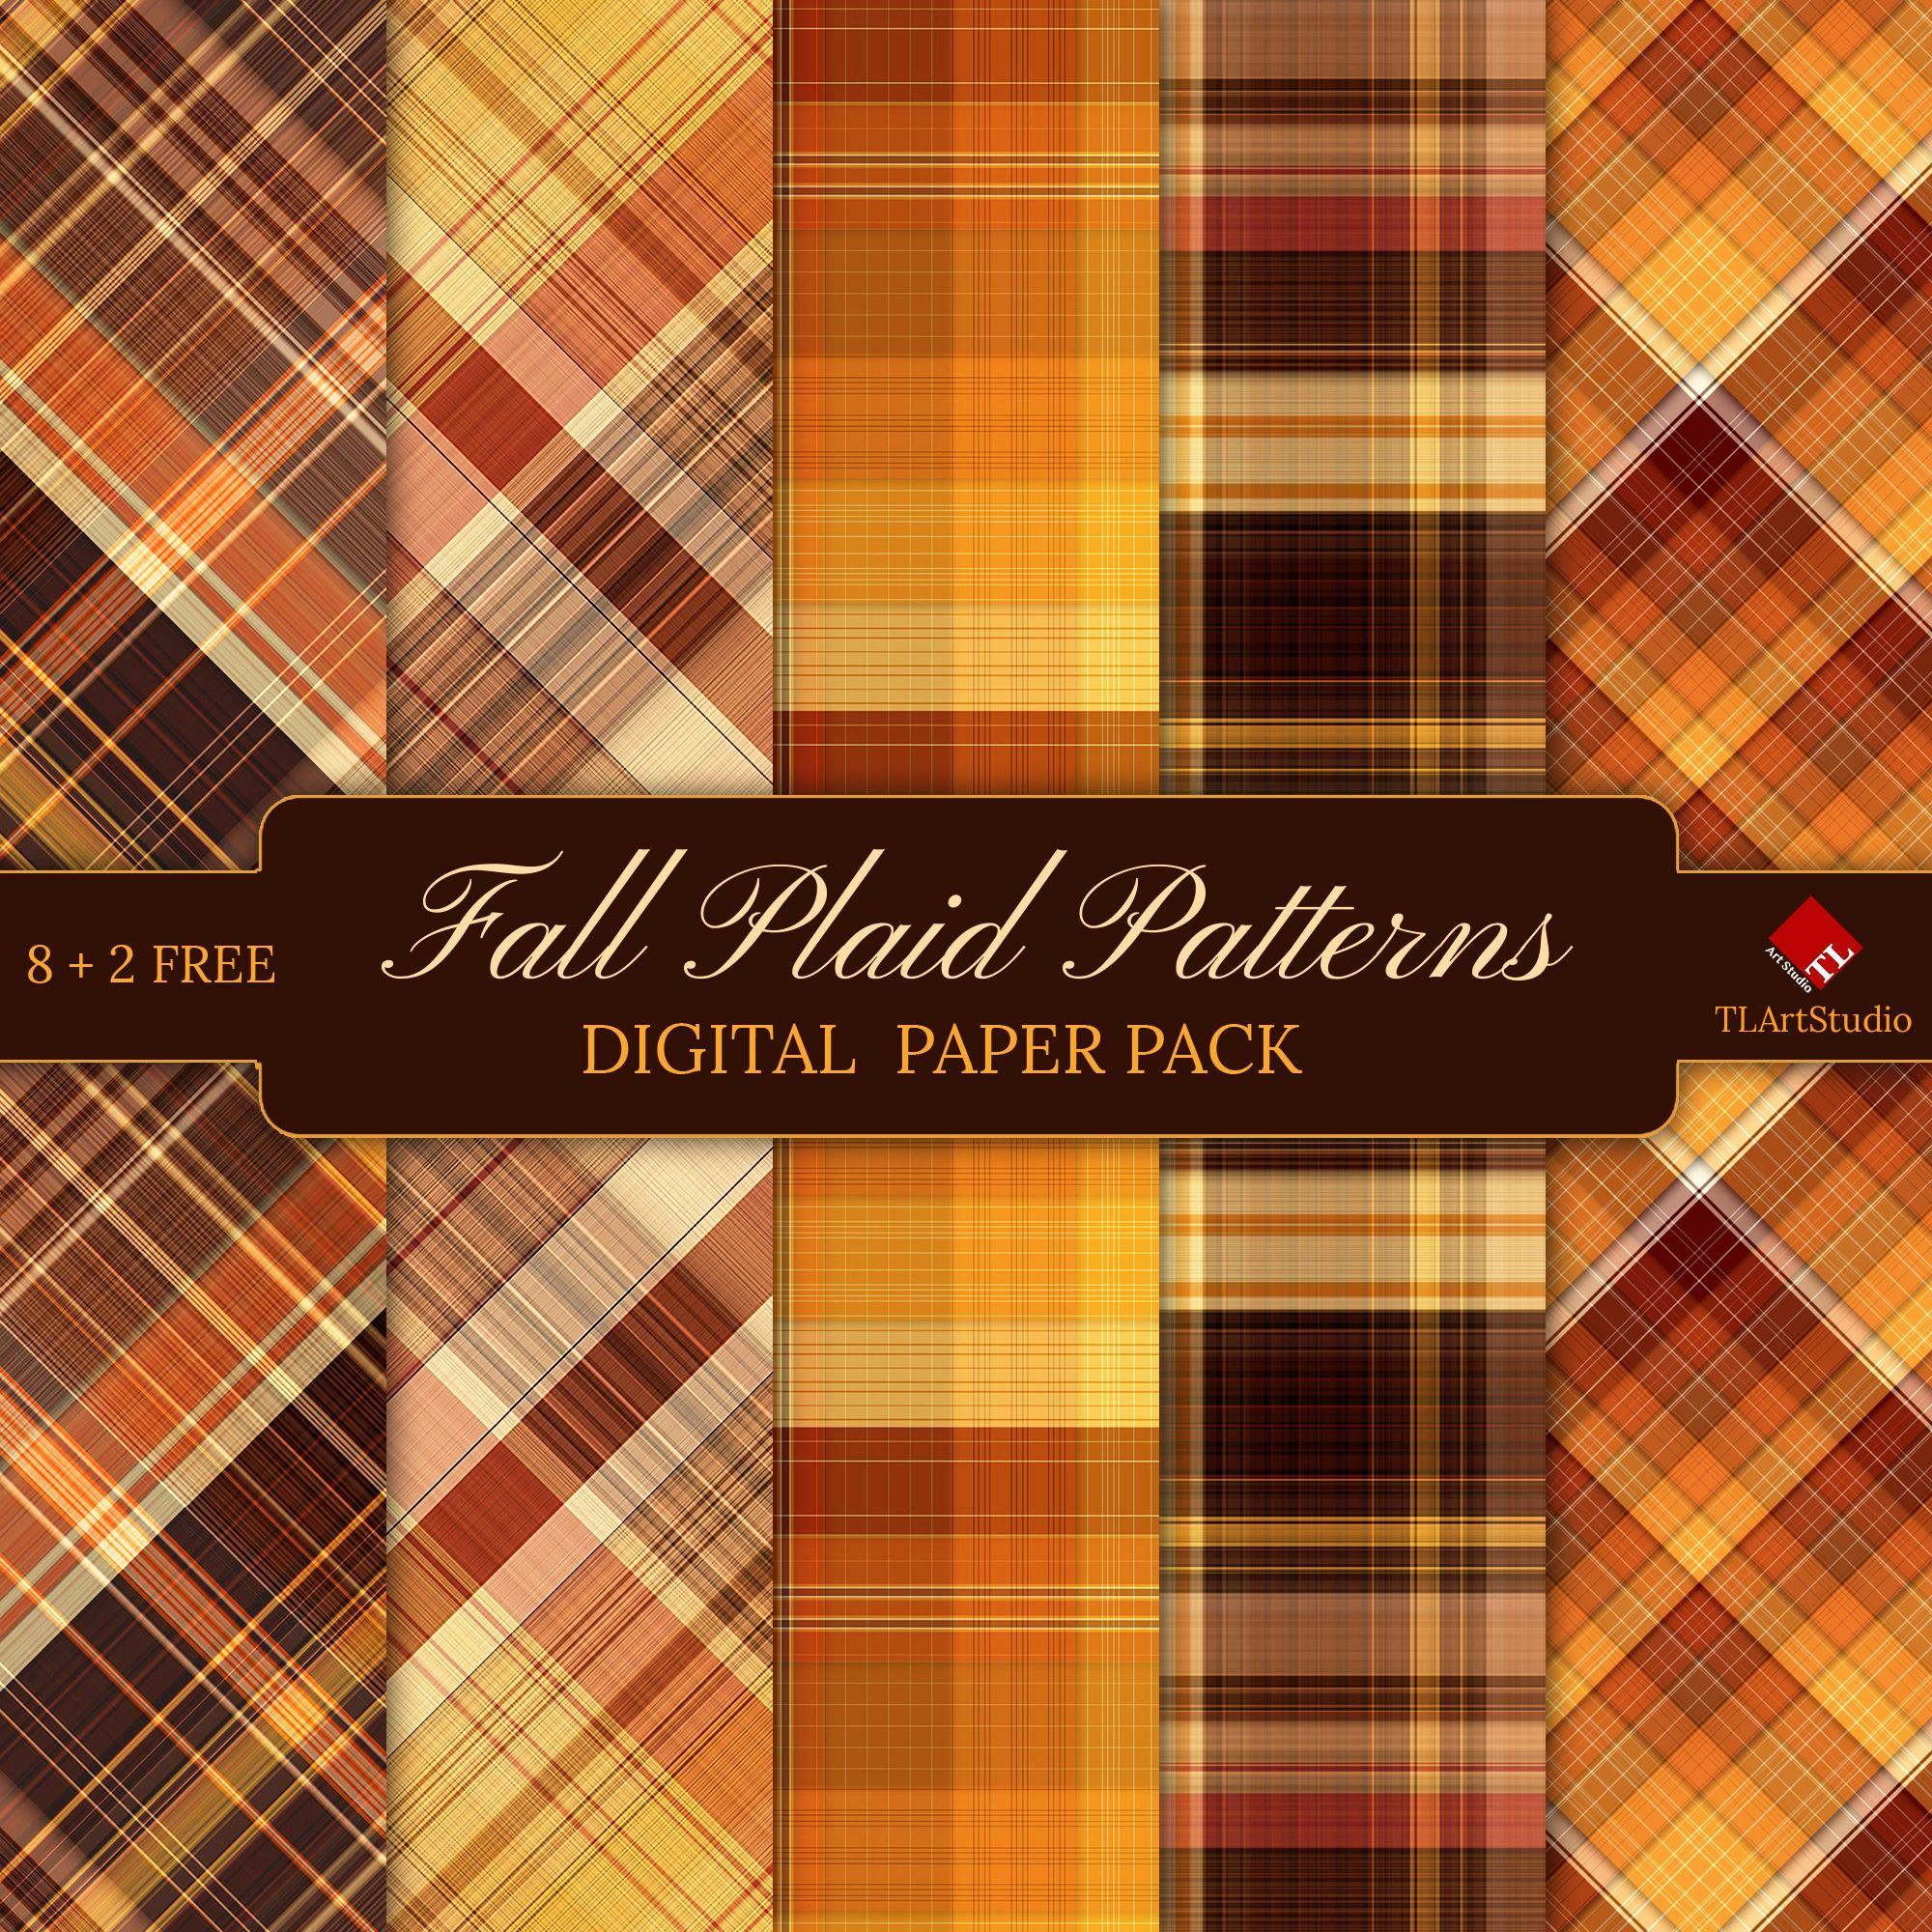 Fall Plaid Patterns Digital Paper Pack 1 Autumn Orange Etsy Digital Paper Scrapbook Background Digital Scrapbook Paper